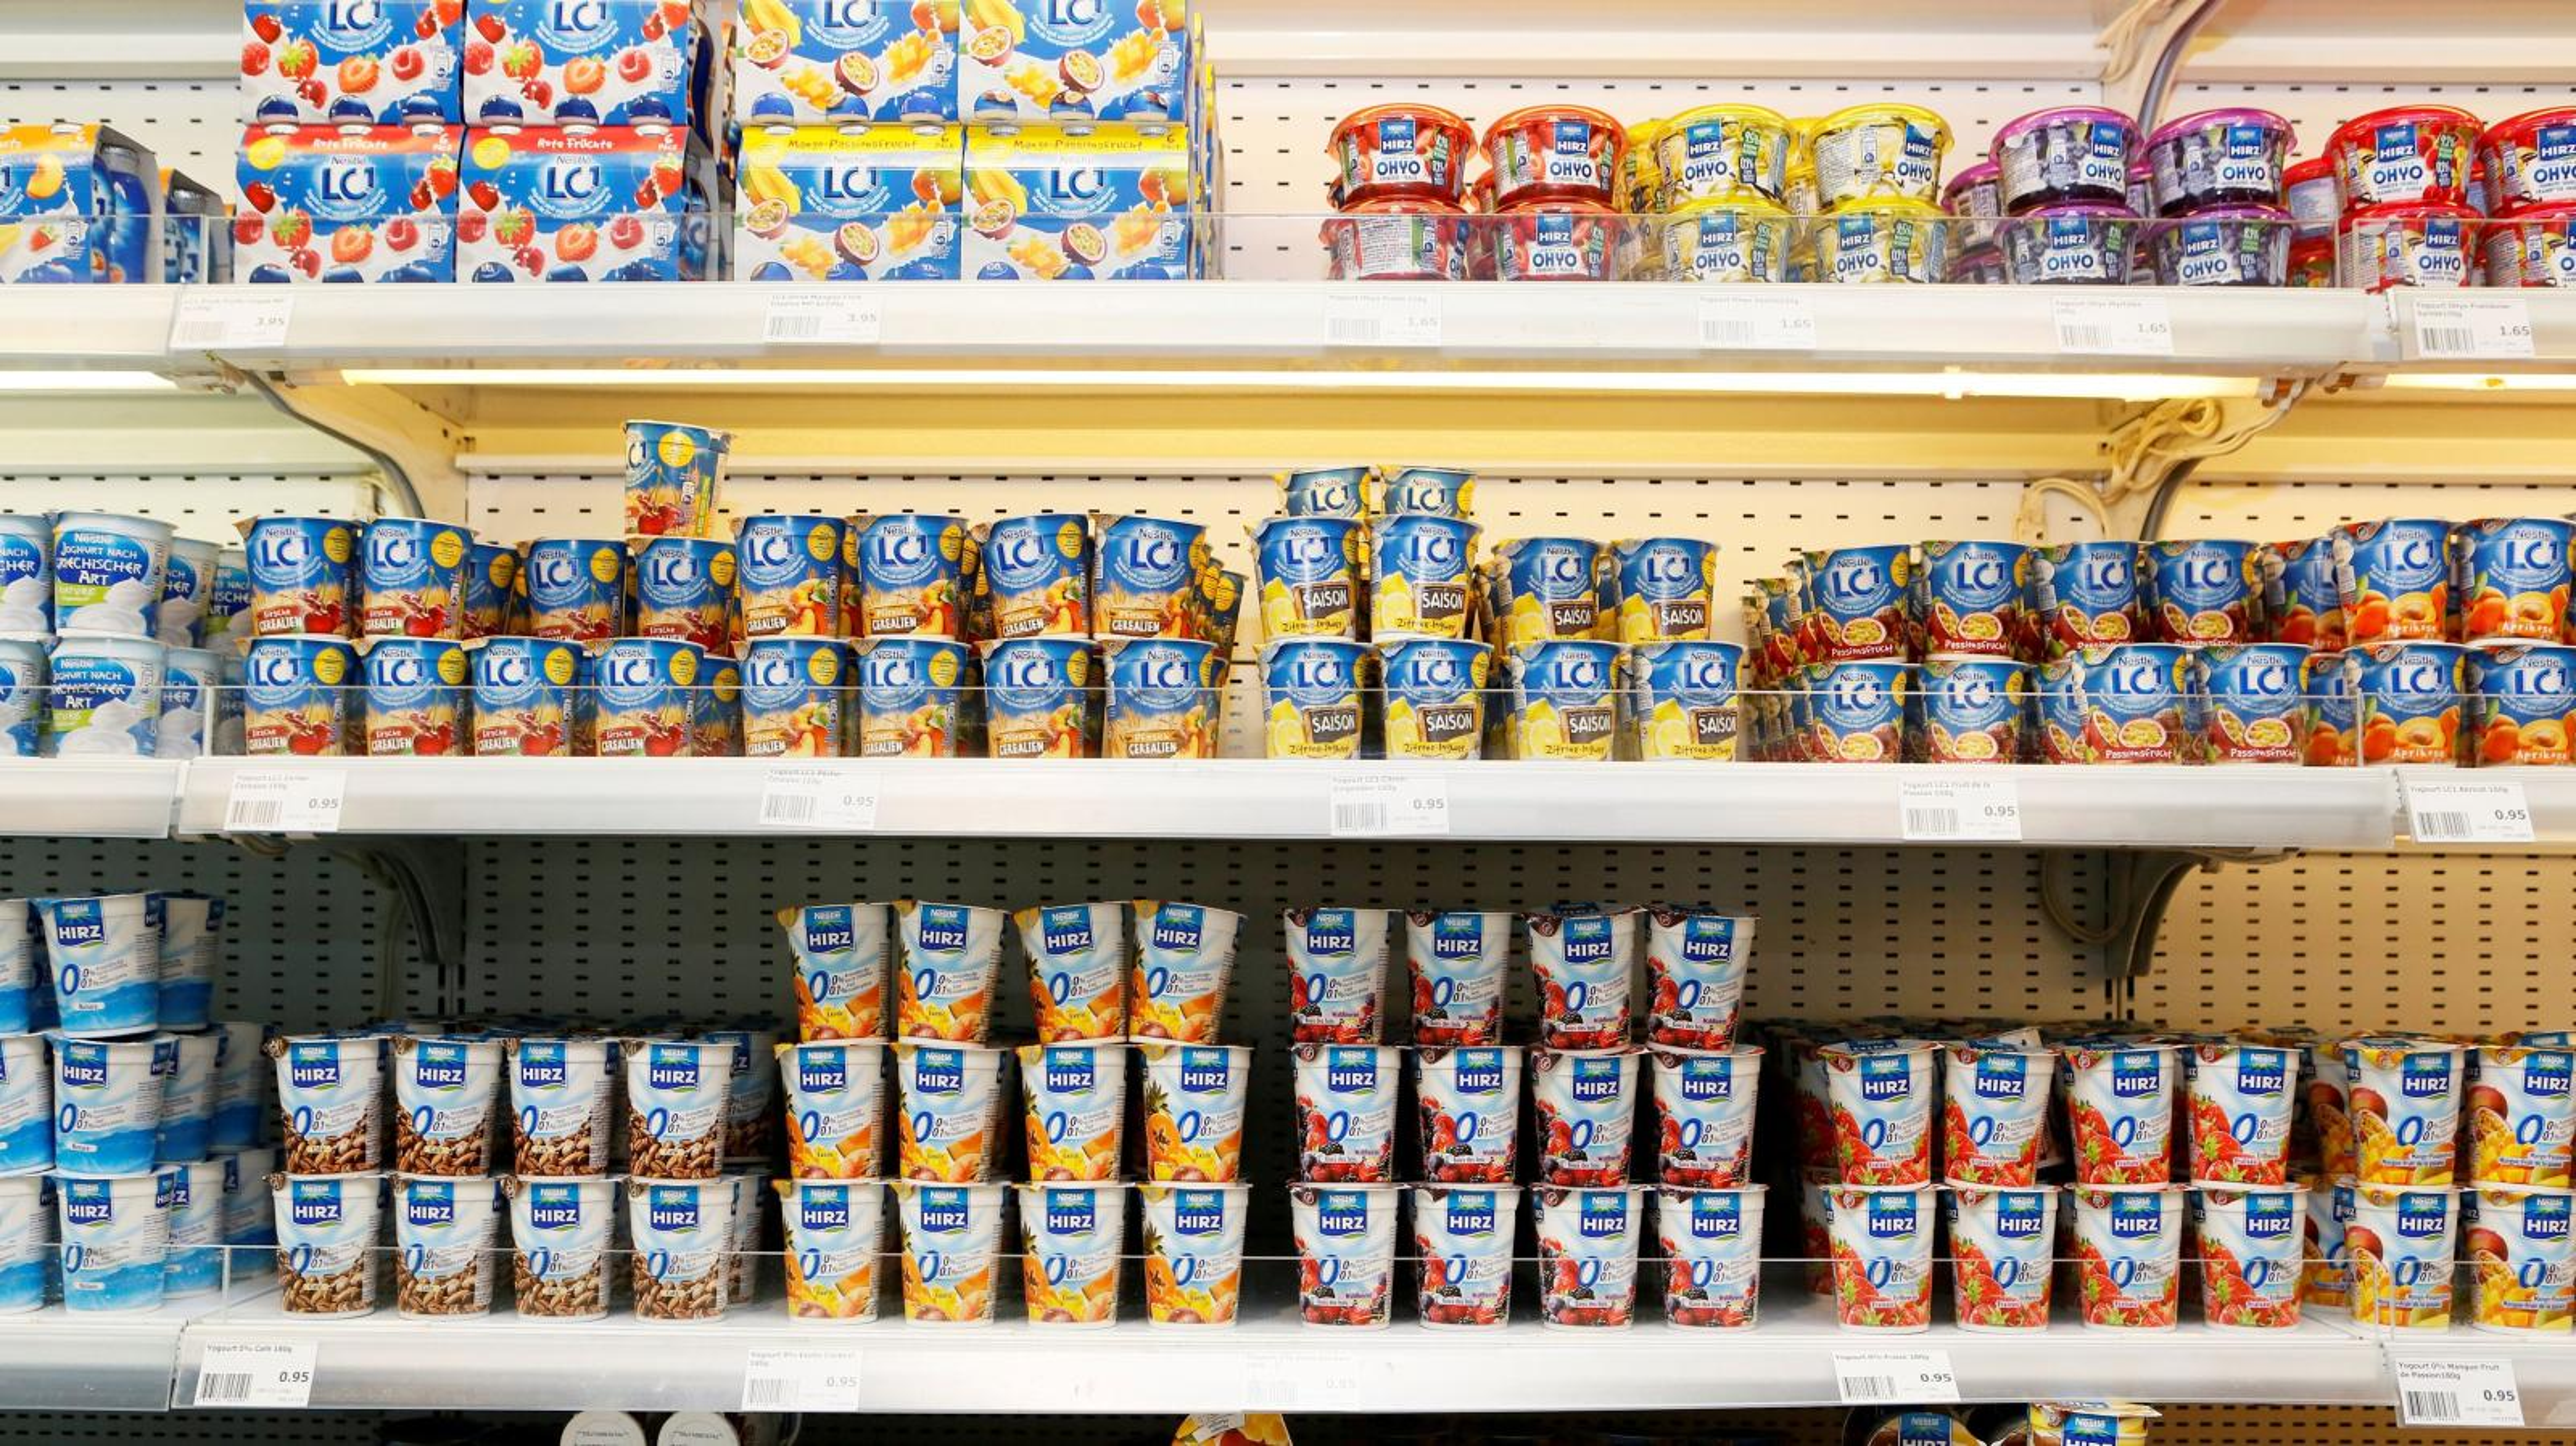 flavored yogurt isn't a healthy snack